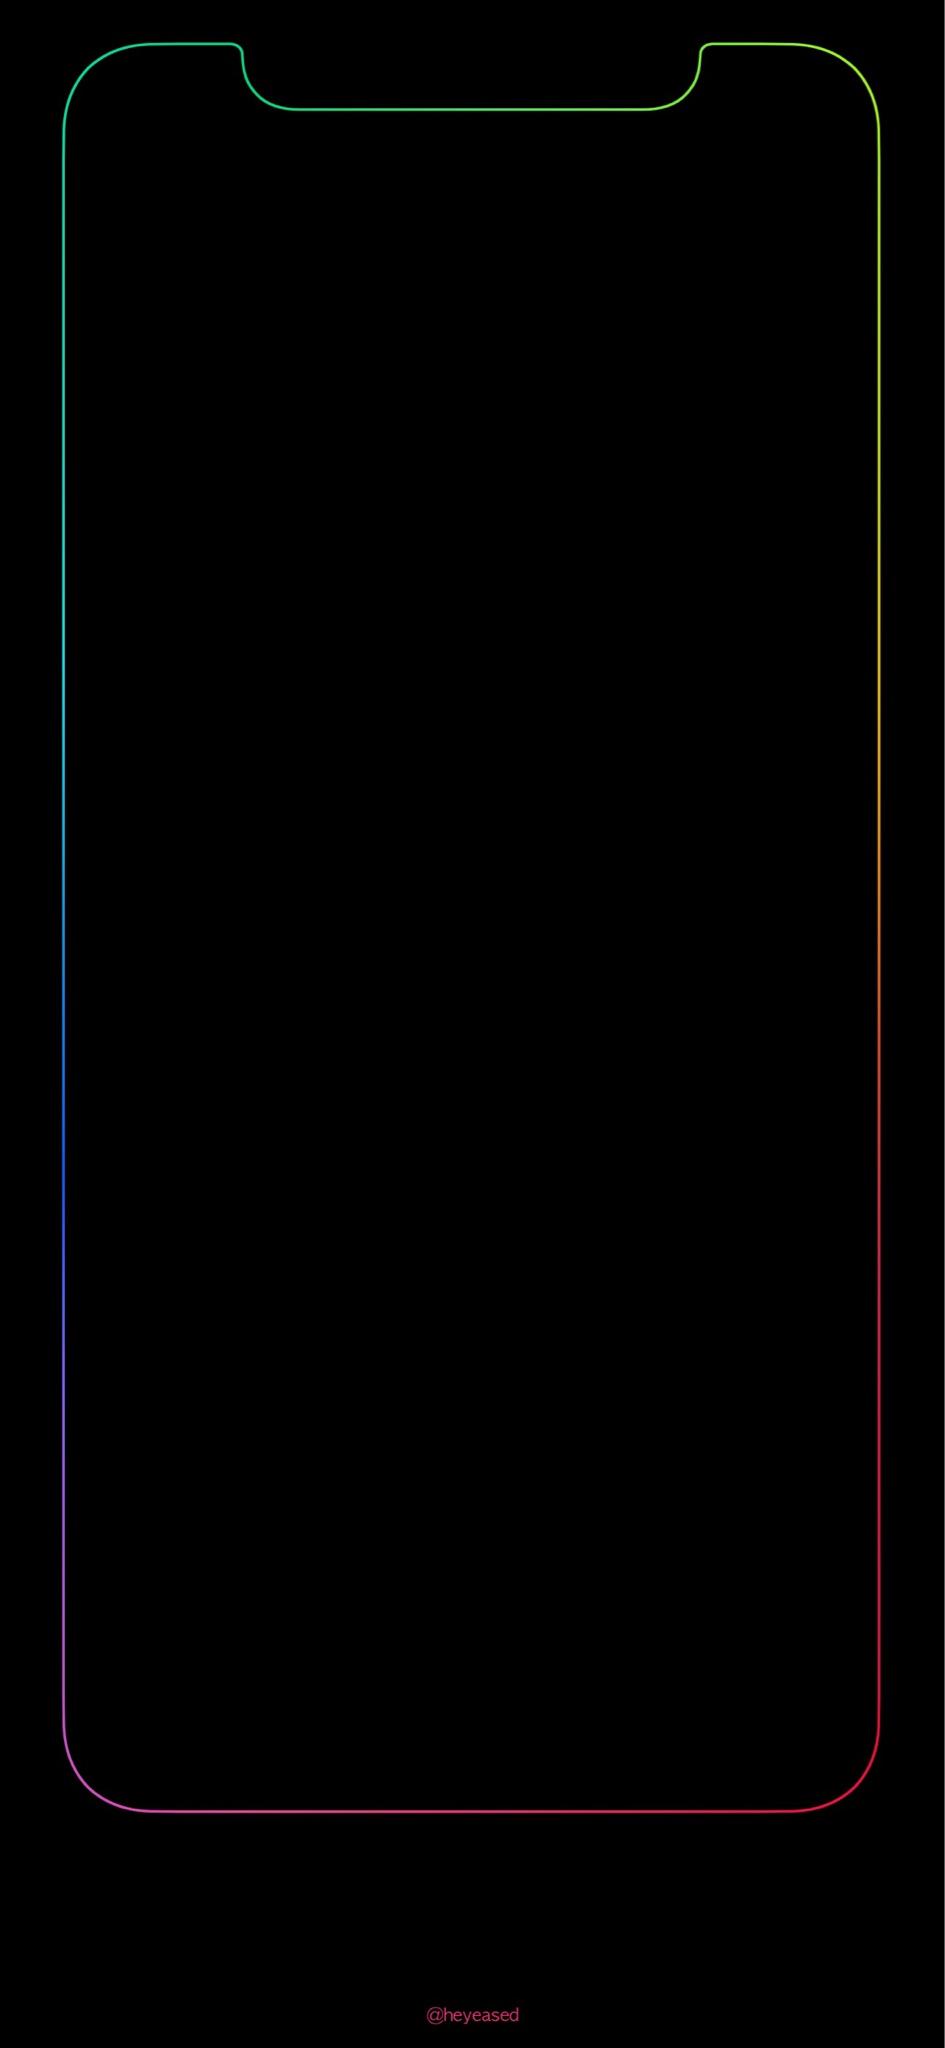 The Iphone X Xs Wallpaper Thread Page 14 Iphone Ipad Ipod